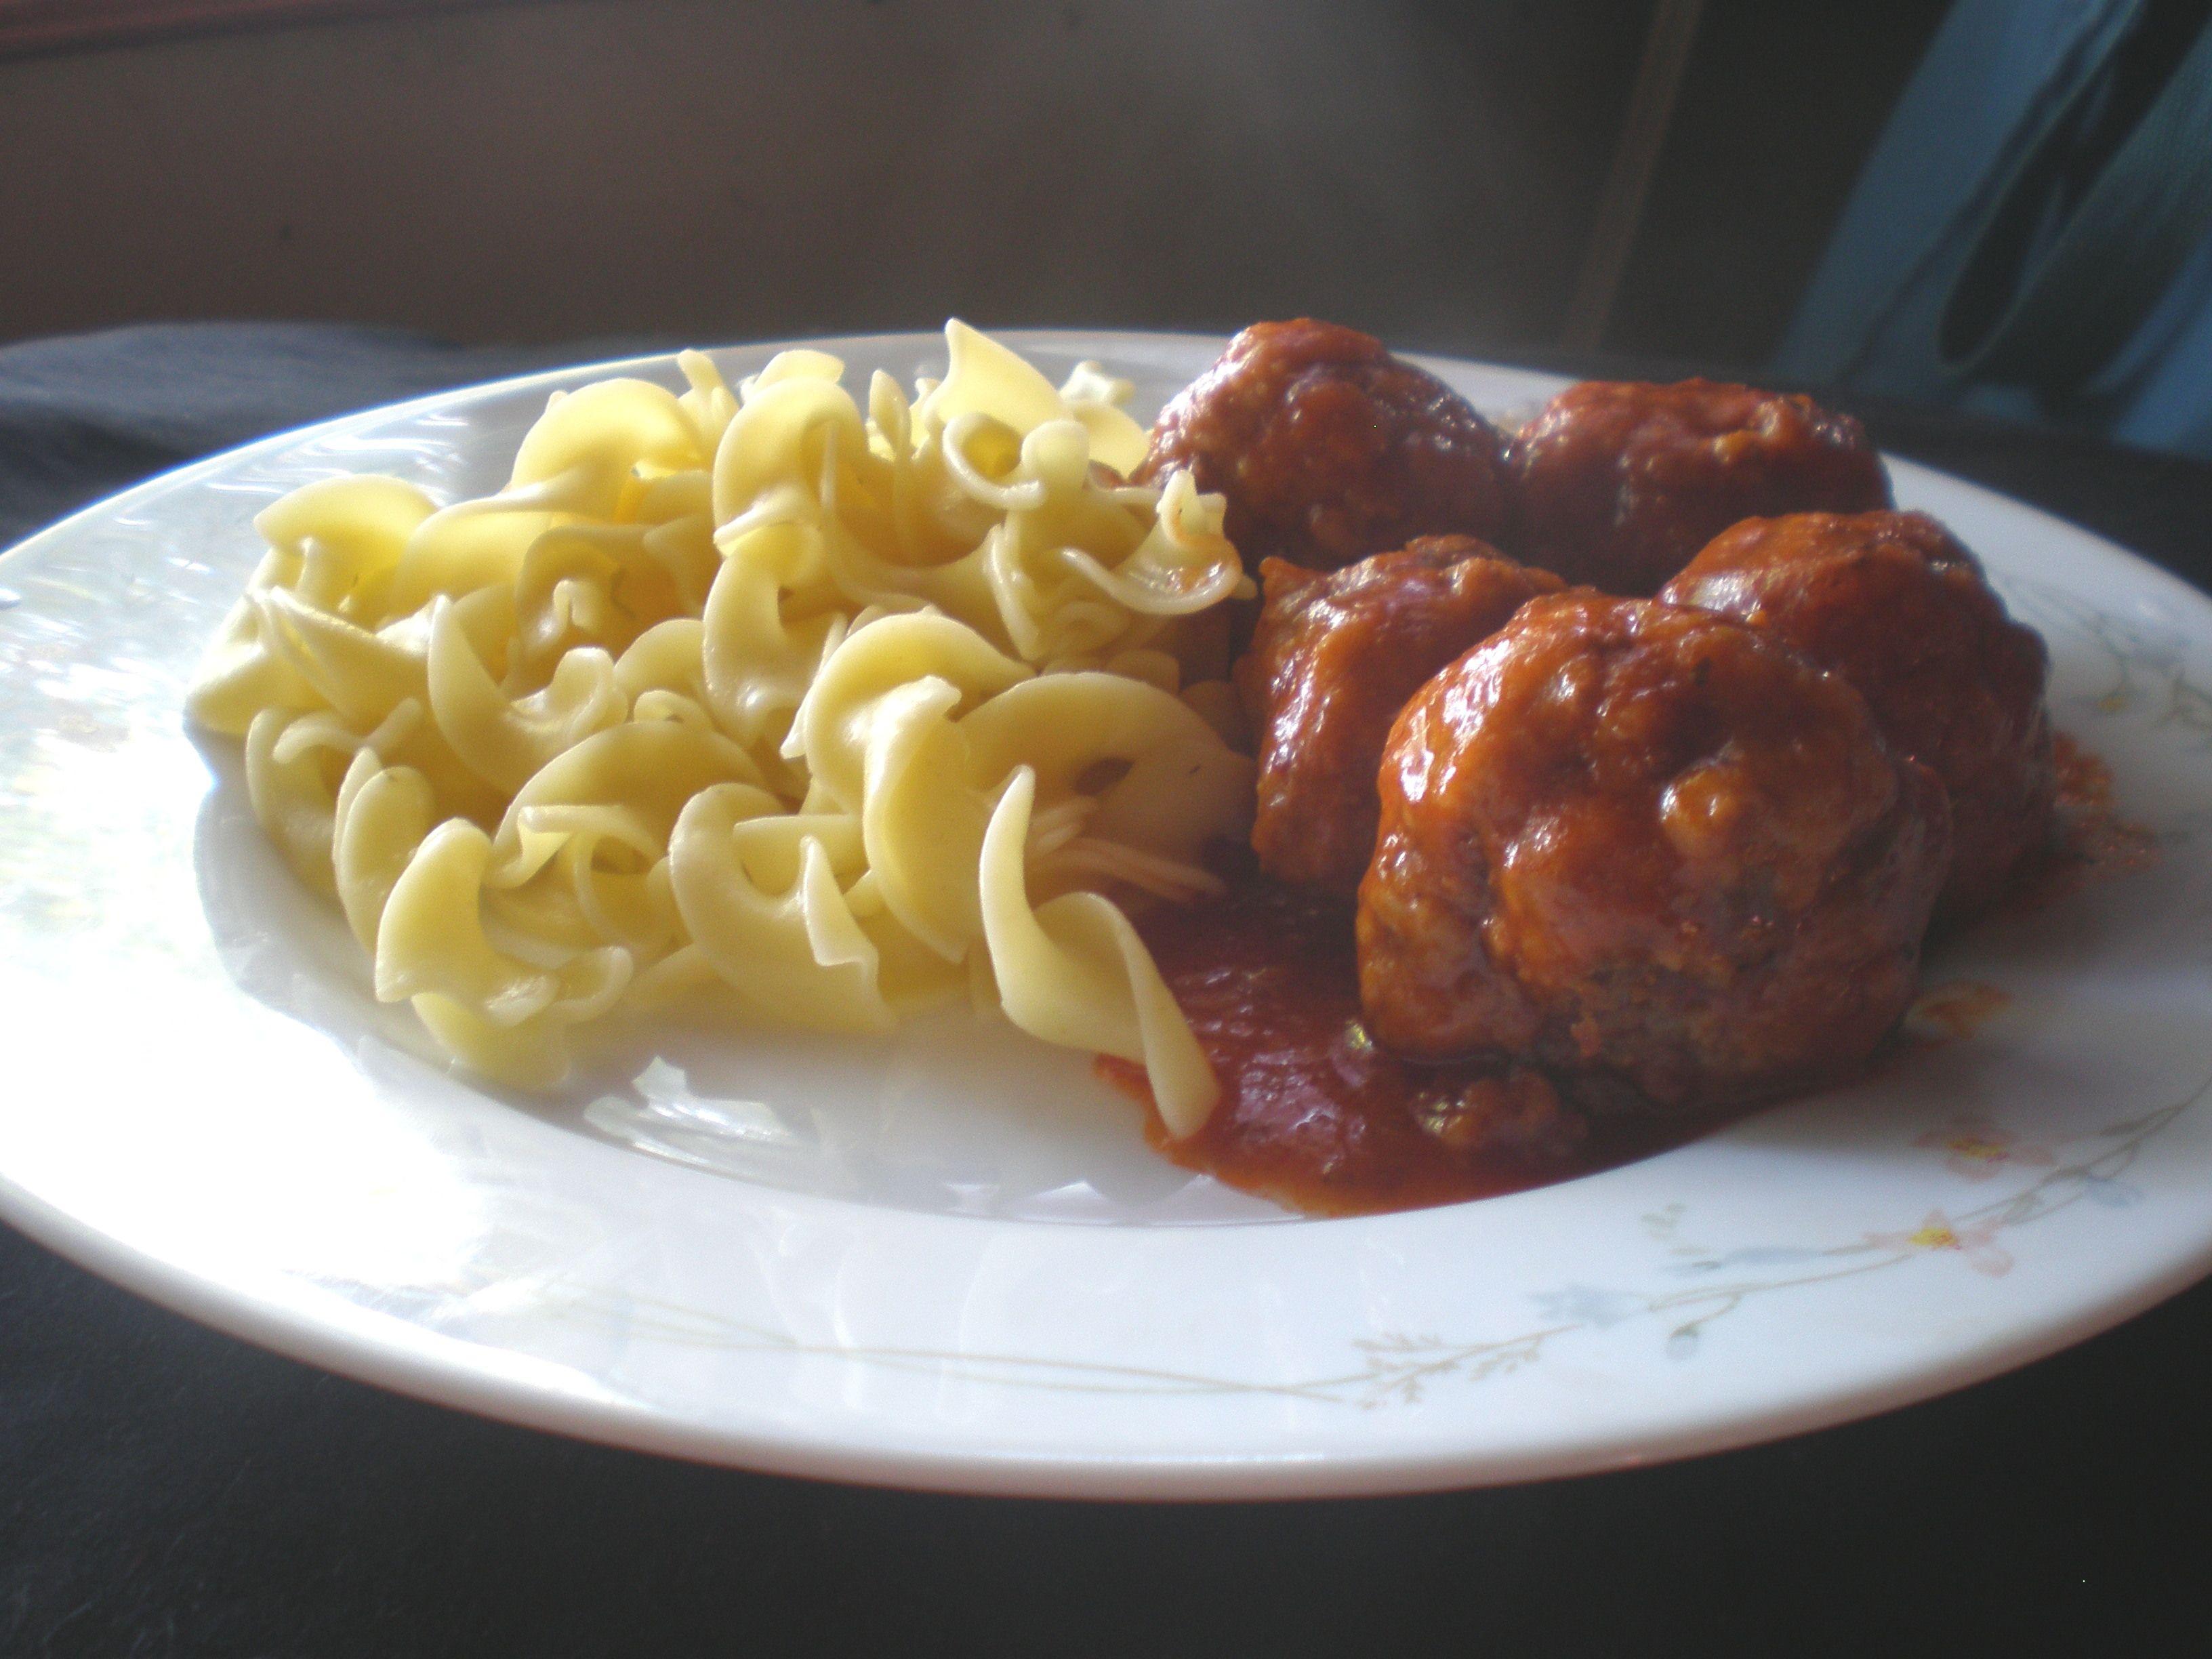 Aunt Wynells' Crowd Pleasing Meatballs | Tasty Kitchen: A Happy Recipe Community!